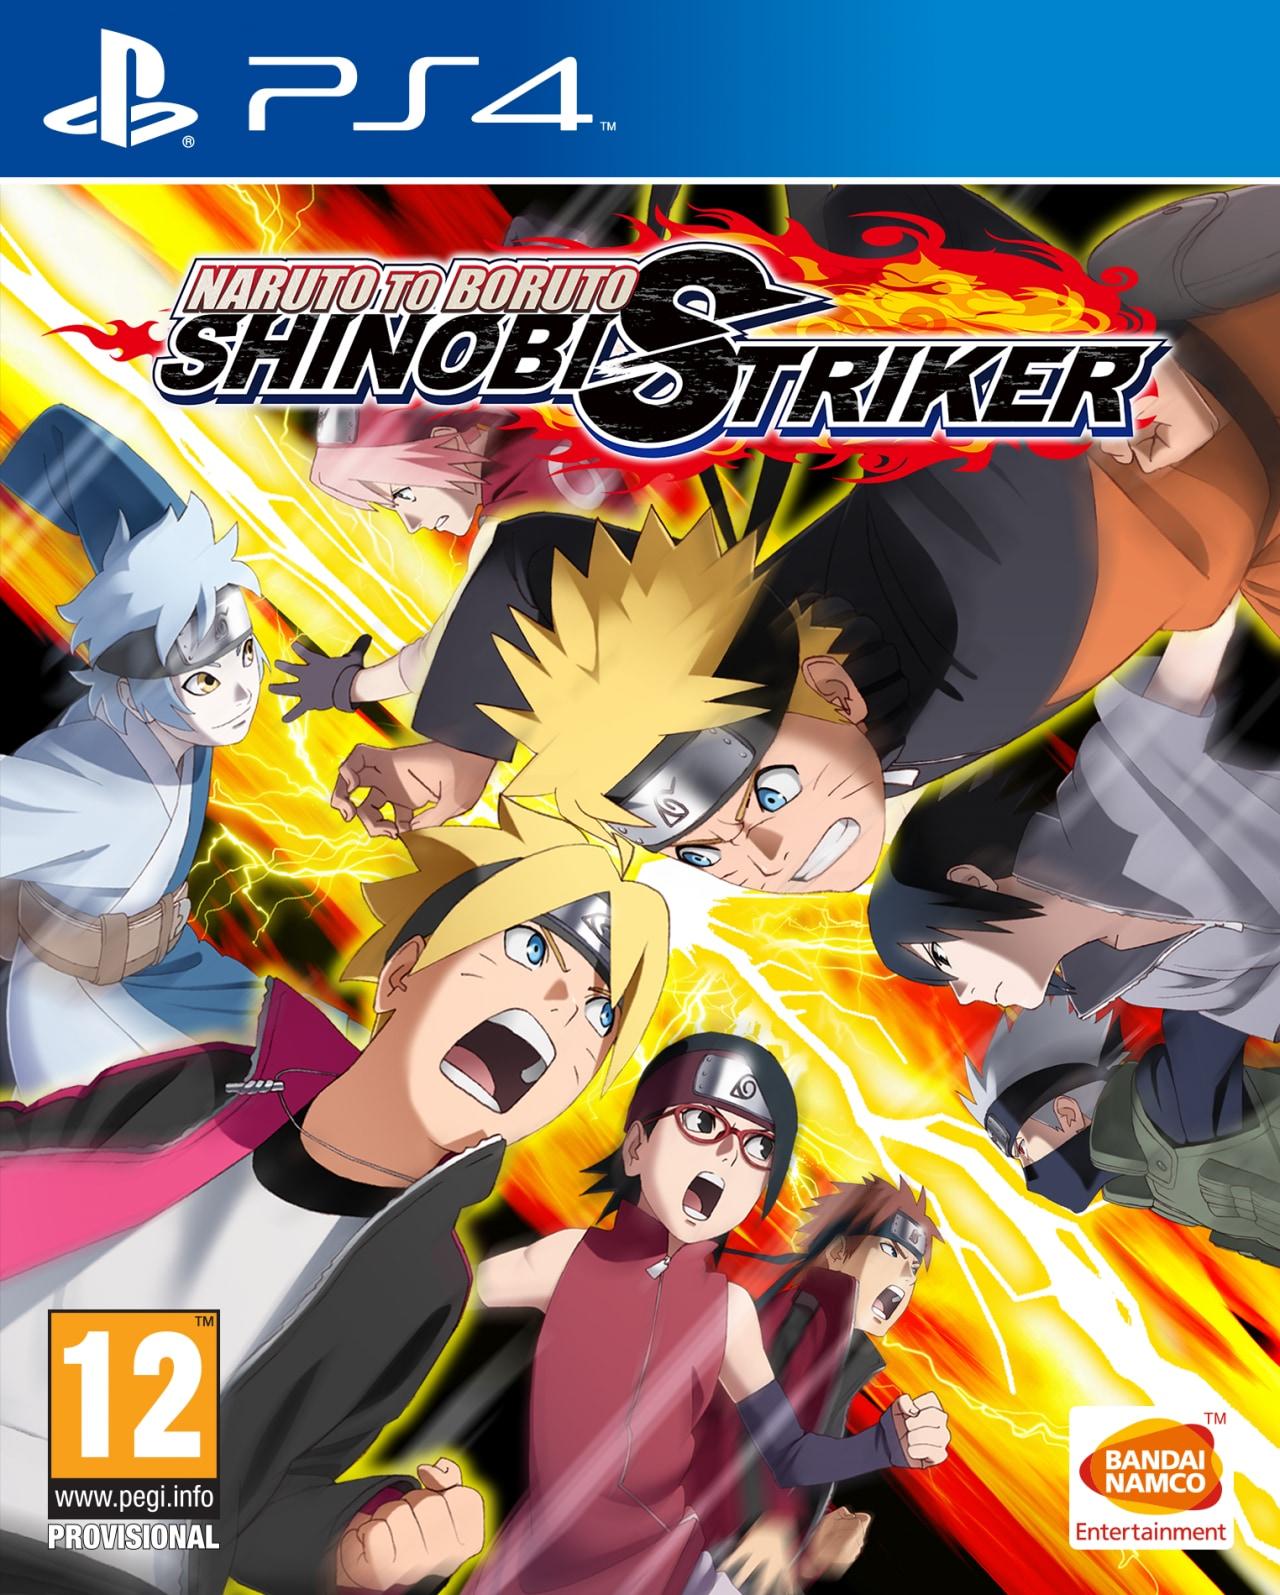 Naruto To Boruto: Shinobi Striker arriverà il 30 agosto (foto e video)